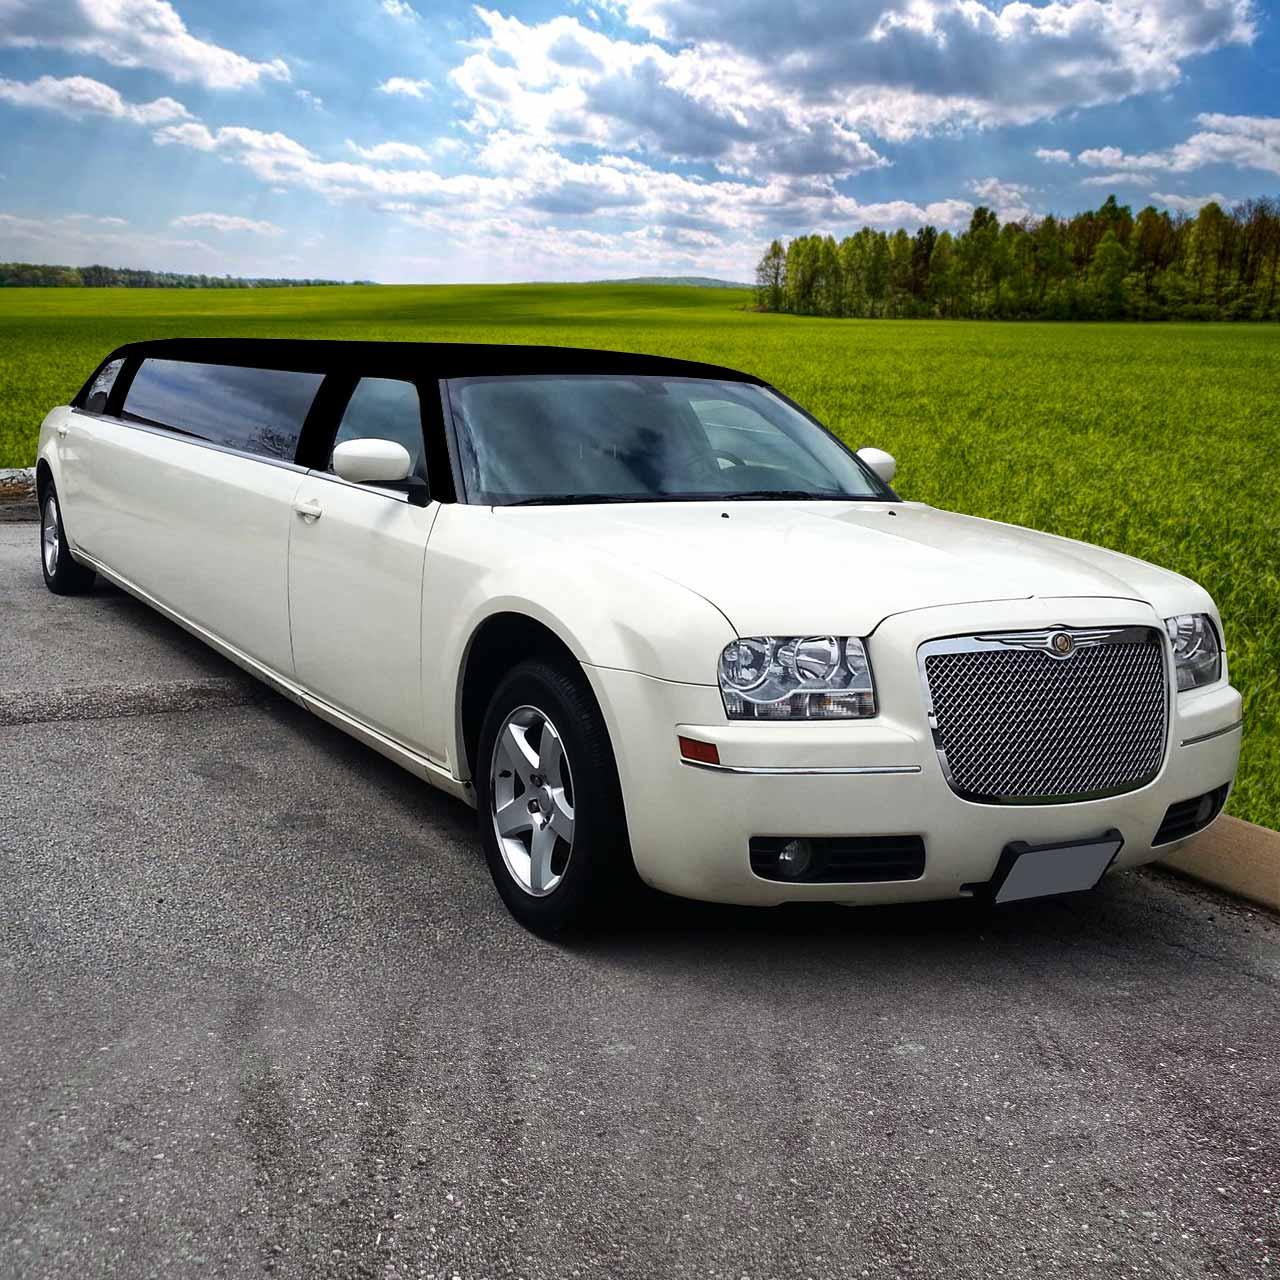 Ghost White Tuxedo Top Chrysler 300 Limo